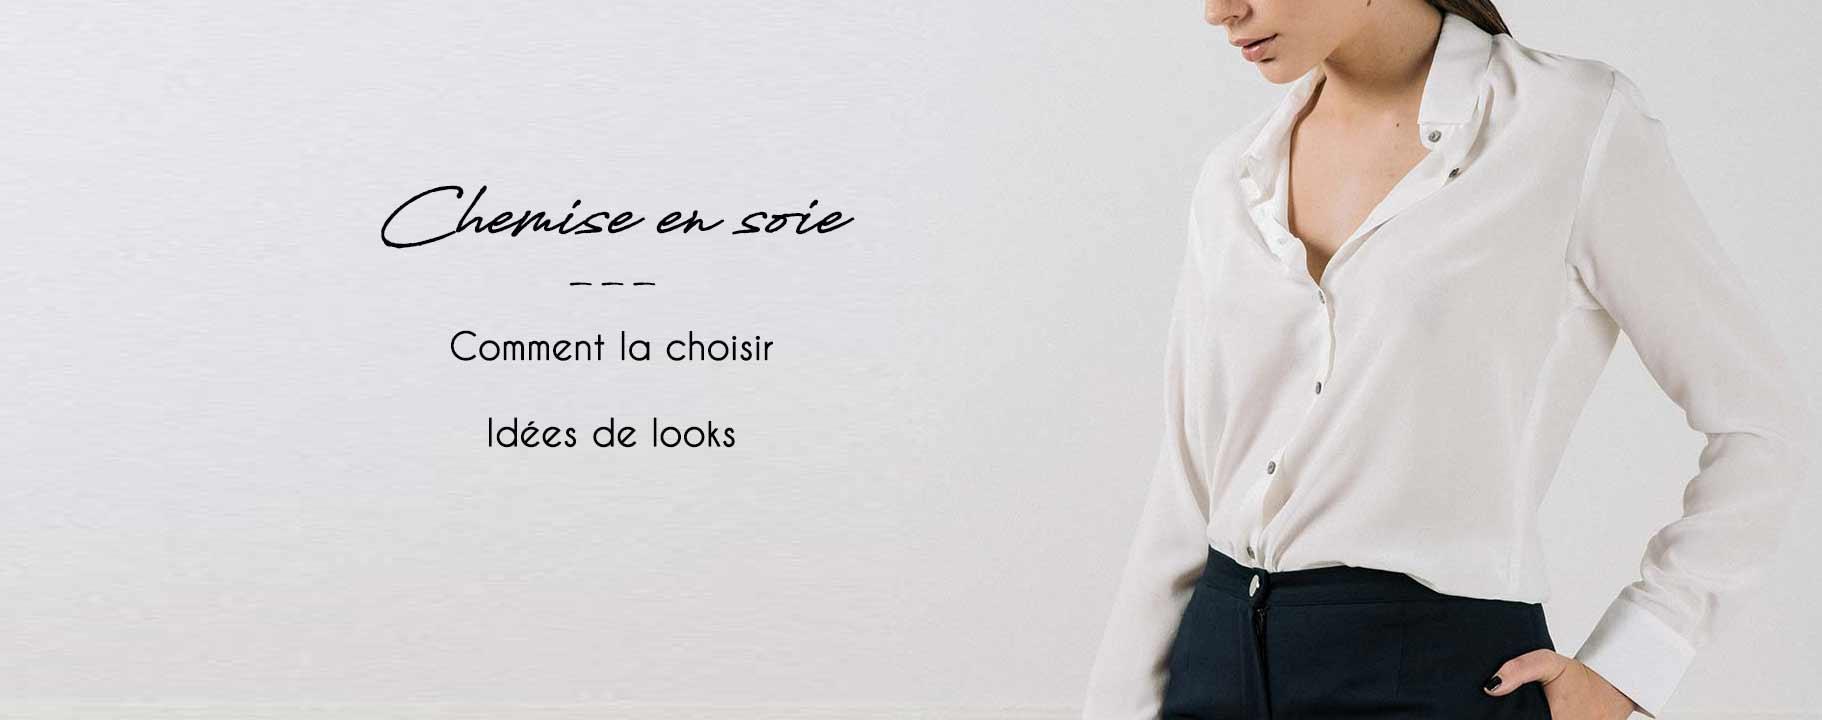 atode choisir sa chemise en soie femme conseils et looks. Black Bedroom Furniture Sets. Home Design Ideas